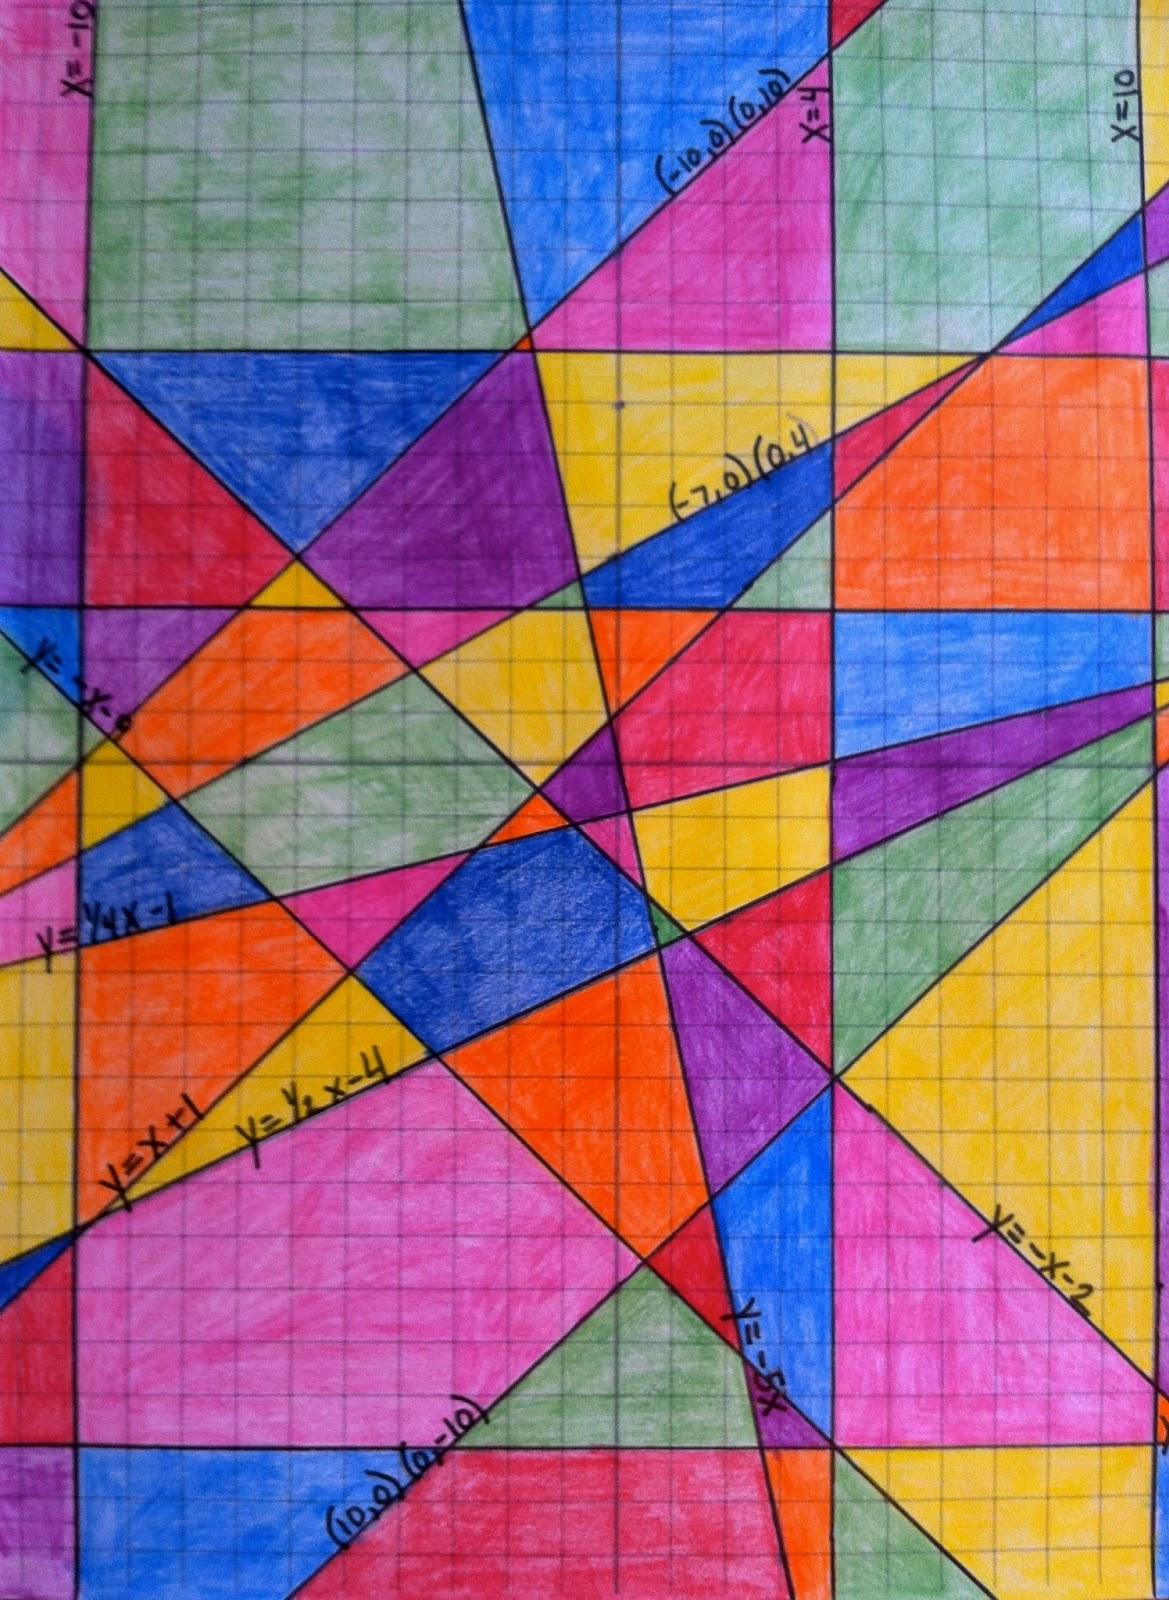 10 geometric art explorations for math learning - HD1169×1600